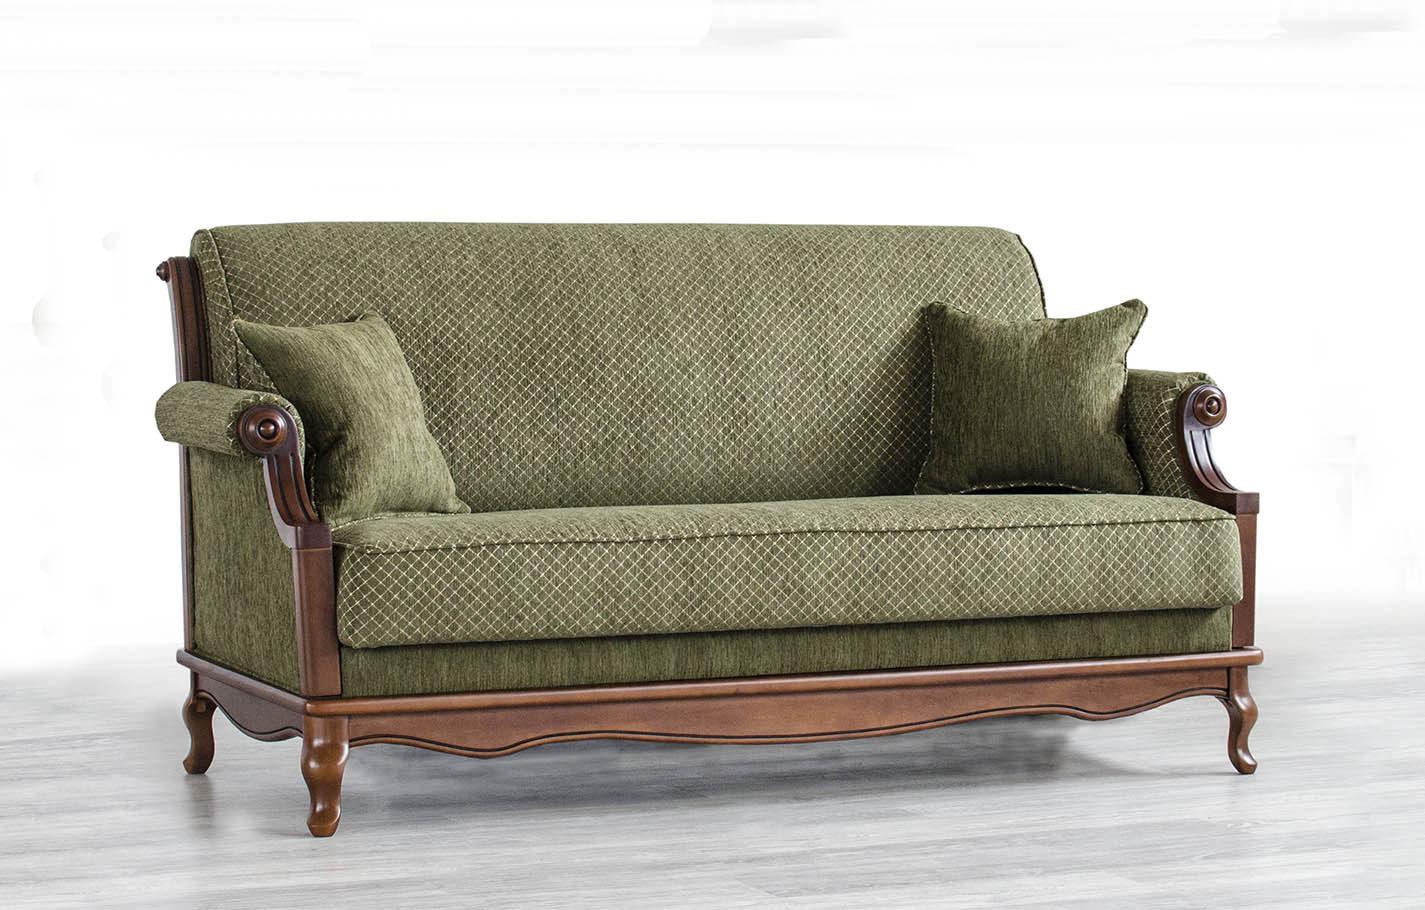 sofa_Palermo_11-e1548320980502